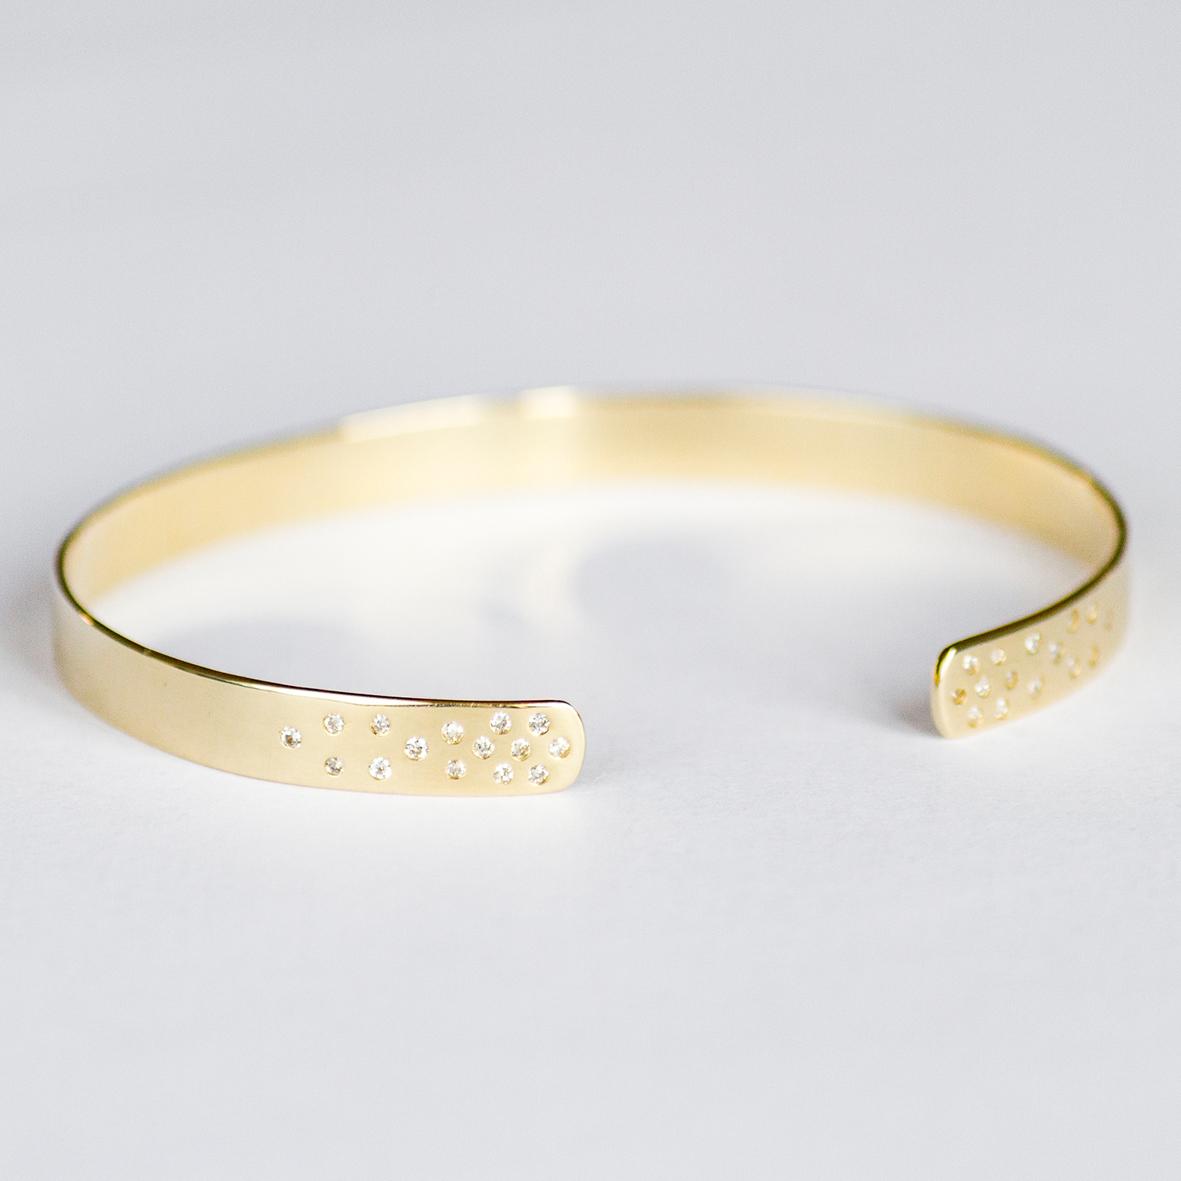 4. OONA_lotus_ficha2_diamond dotted bracelet